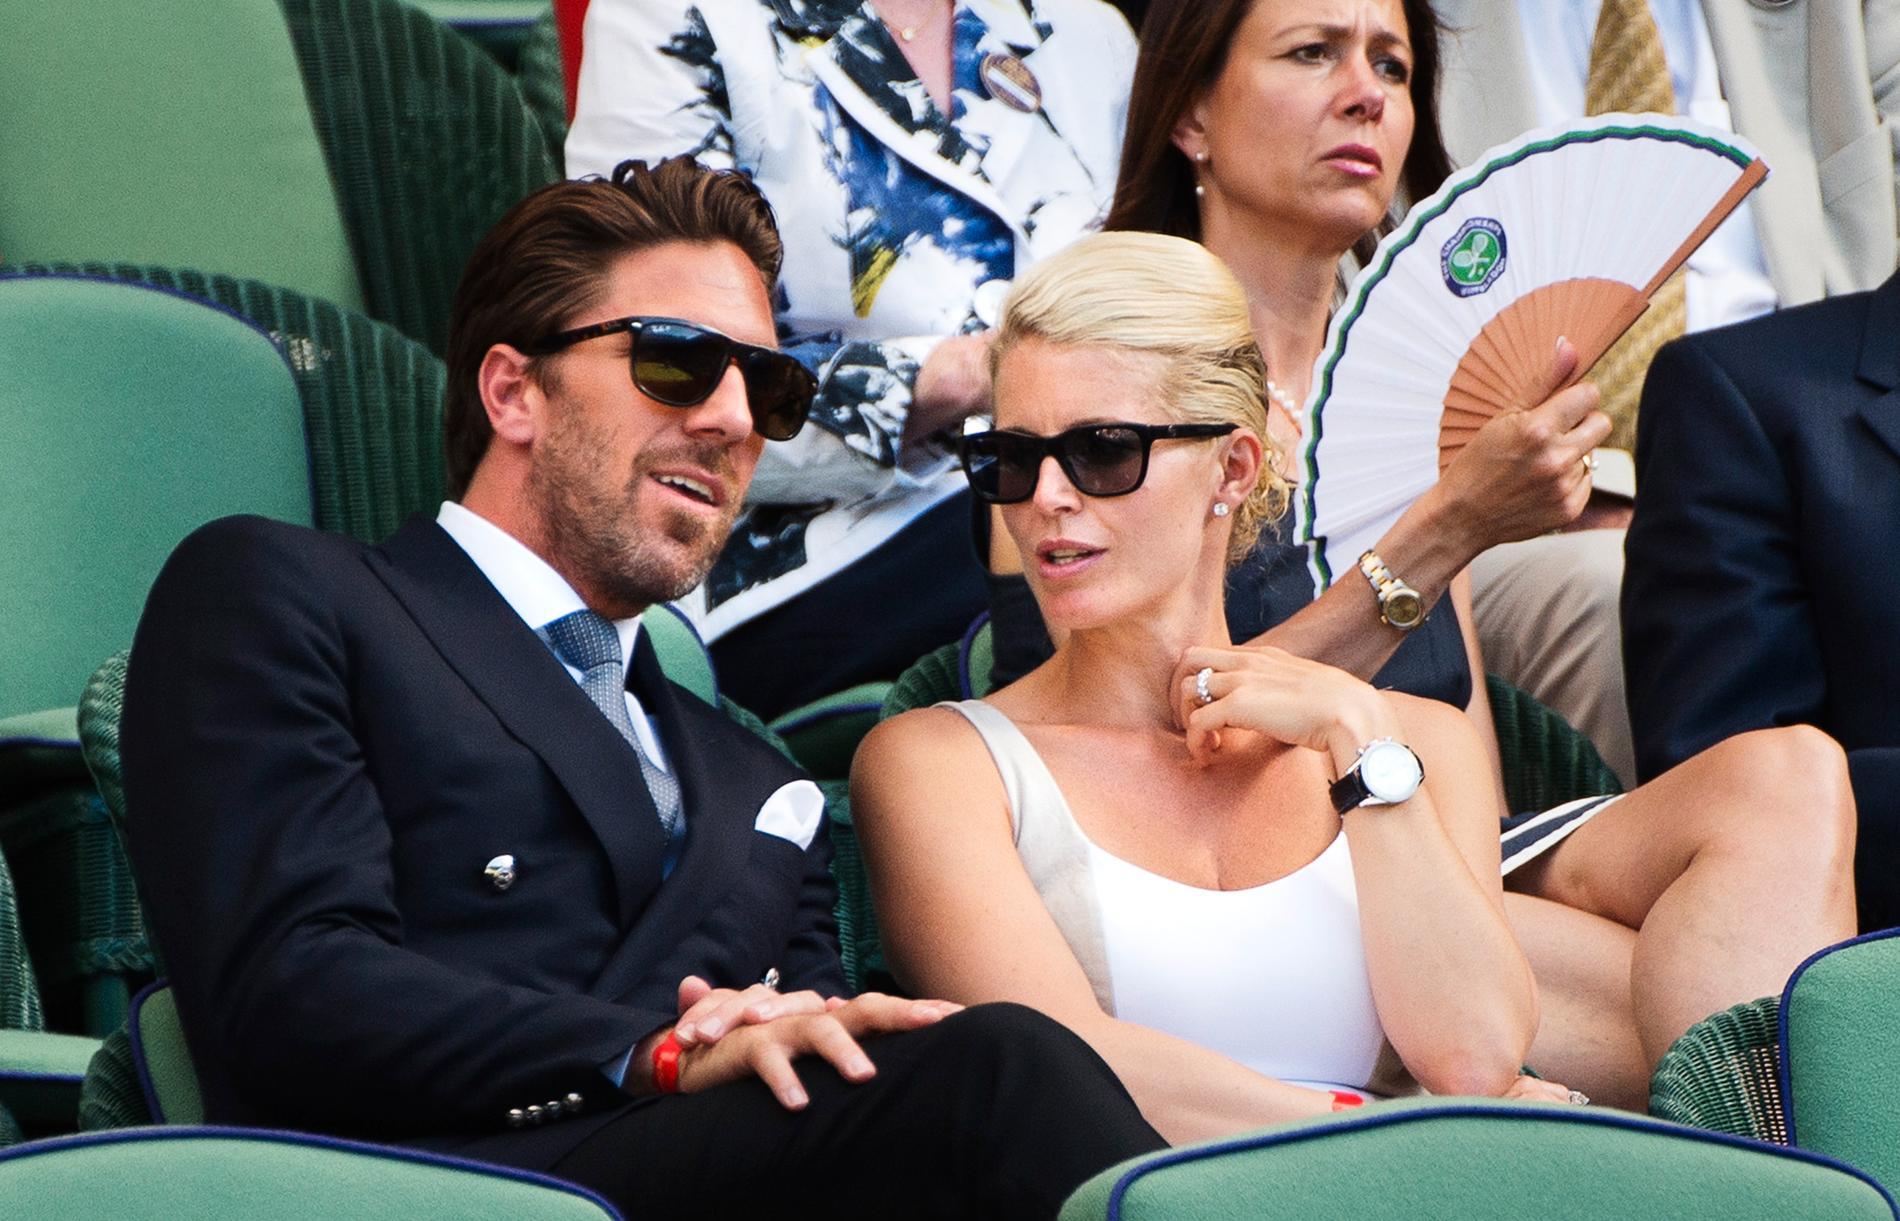 Henrik Lundqvist med sin fru Therese Andersson vid Wimbledon 2015.